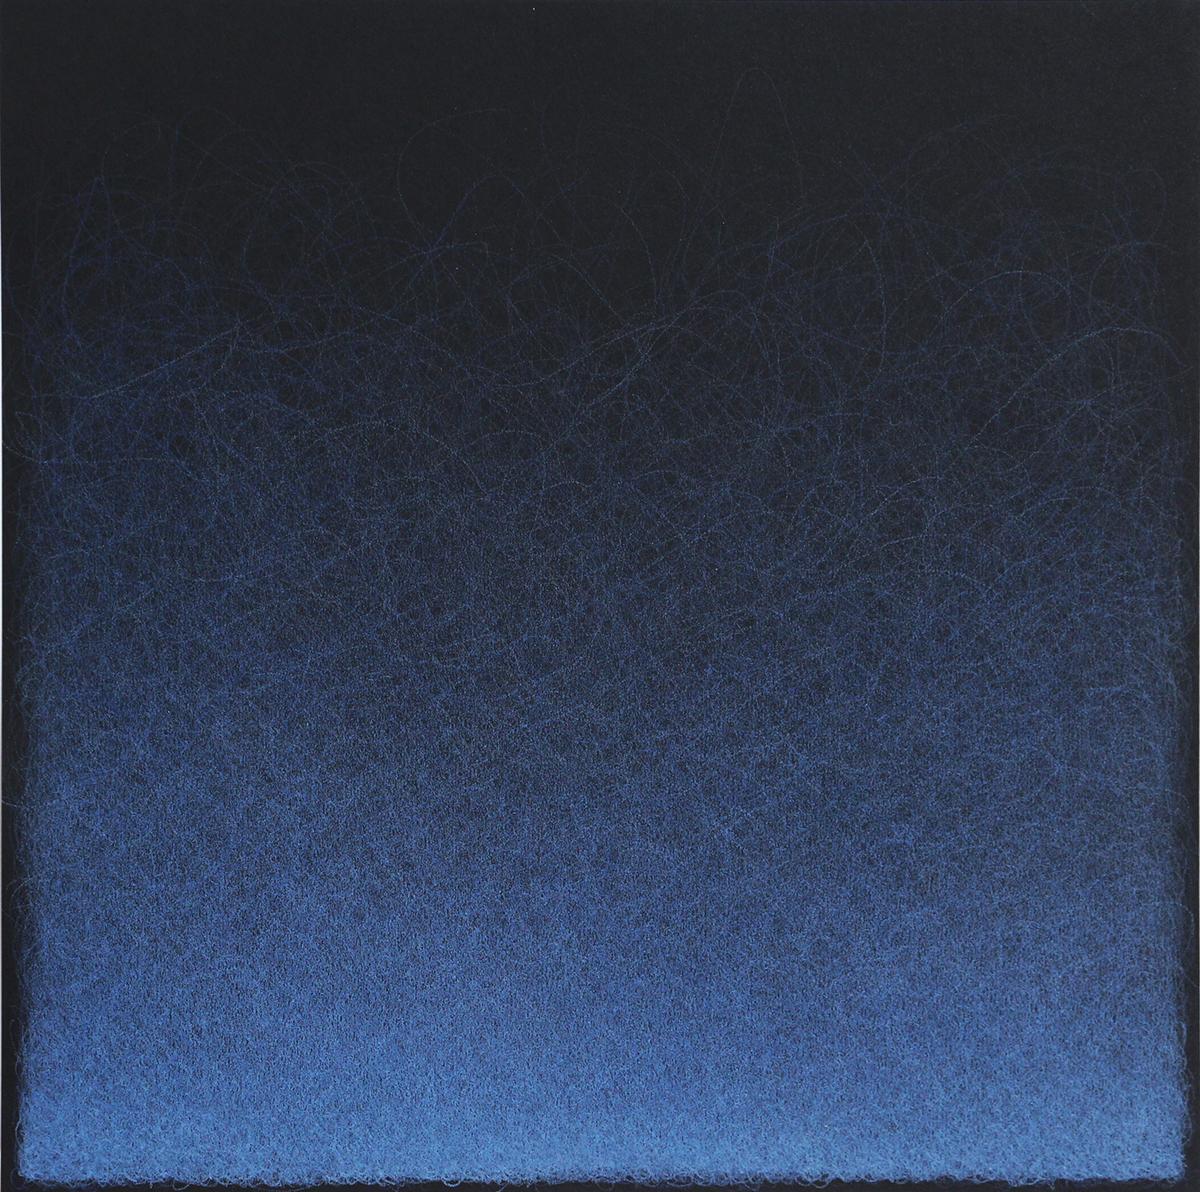 Quantum Entanglement (Ultramarine 2)